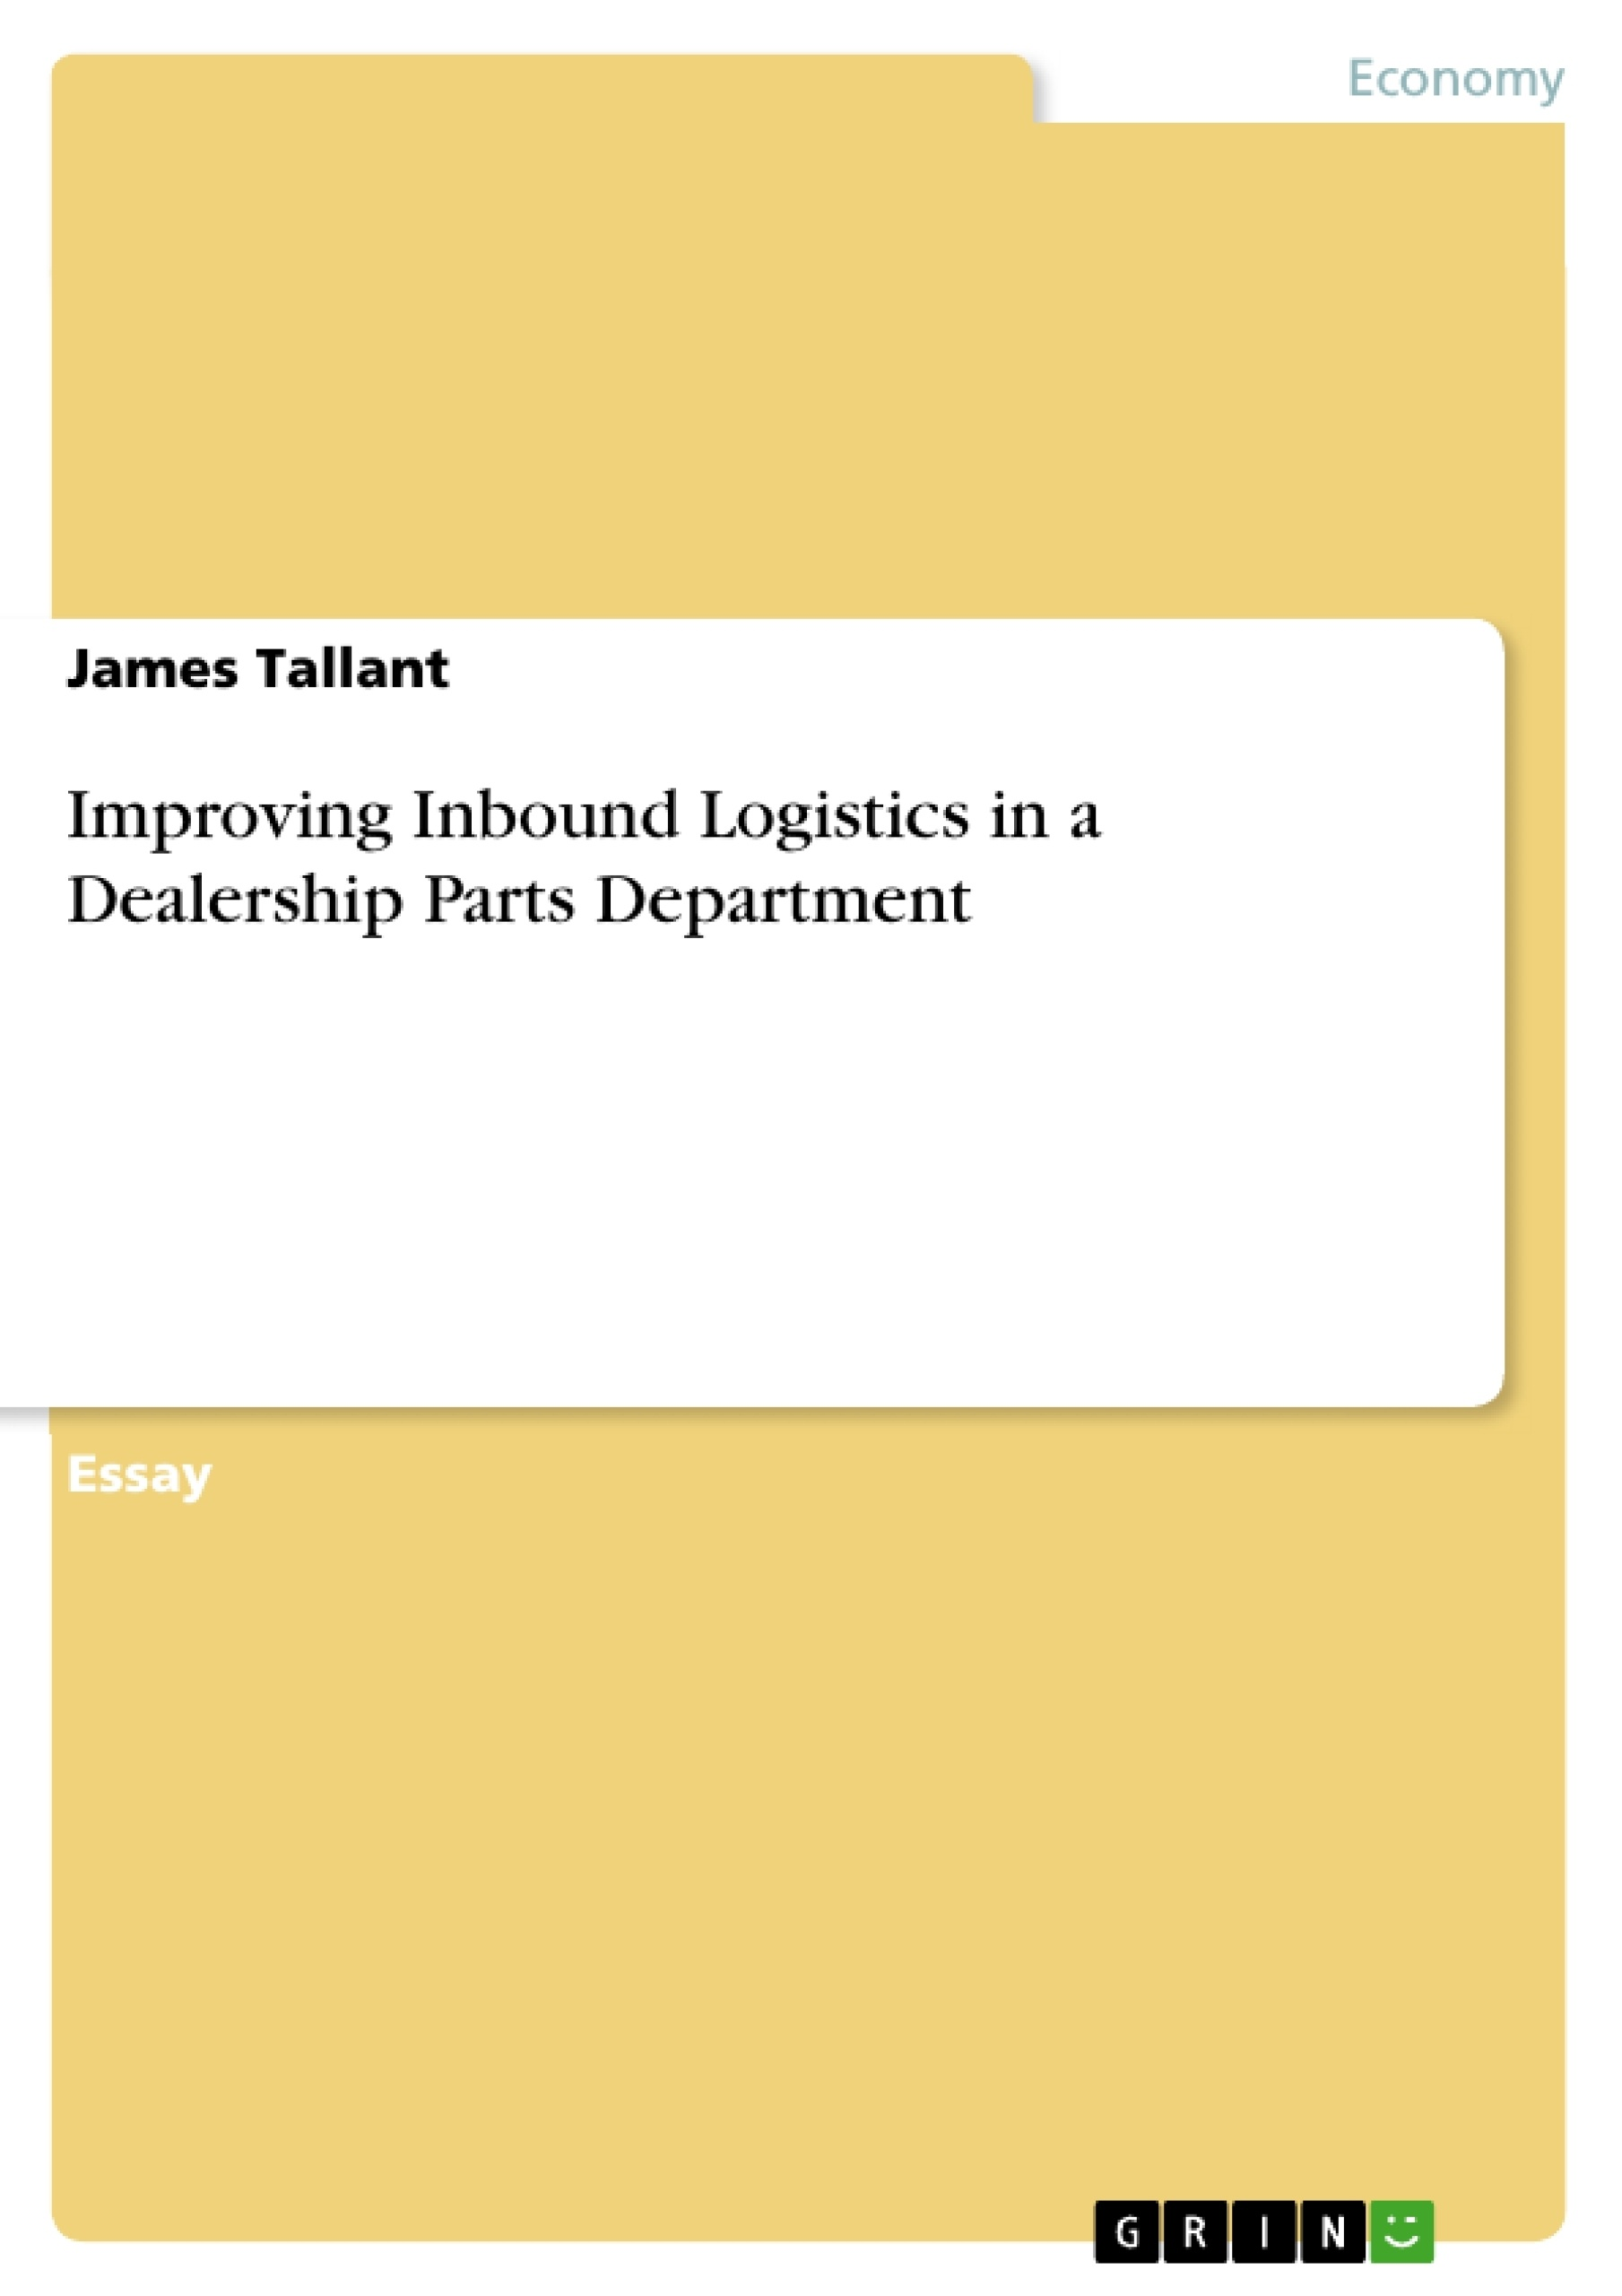 Title: Improving Inbound Logistics in a Dealership Parts Department